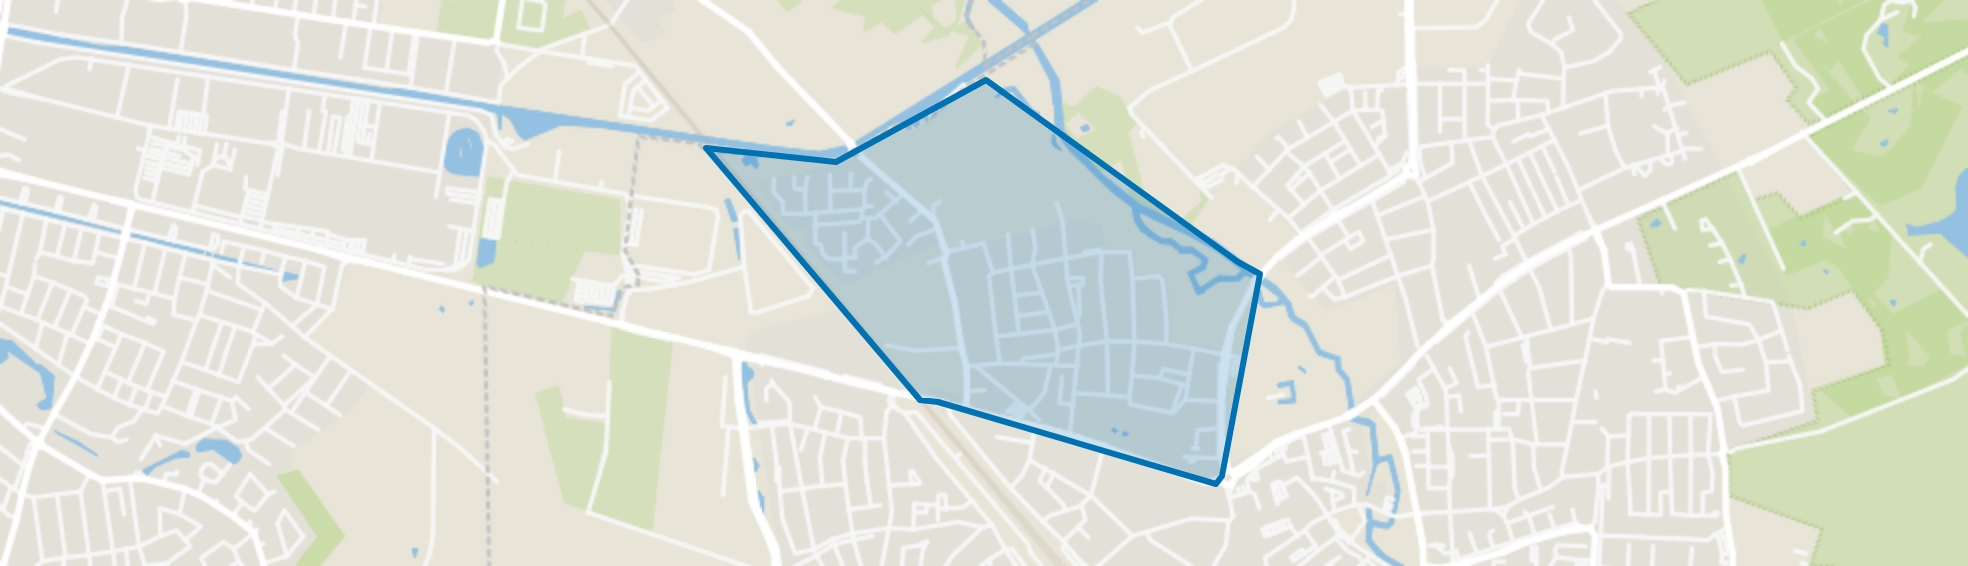 Skandia, Geldrop map